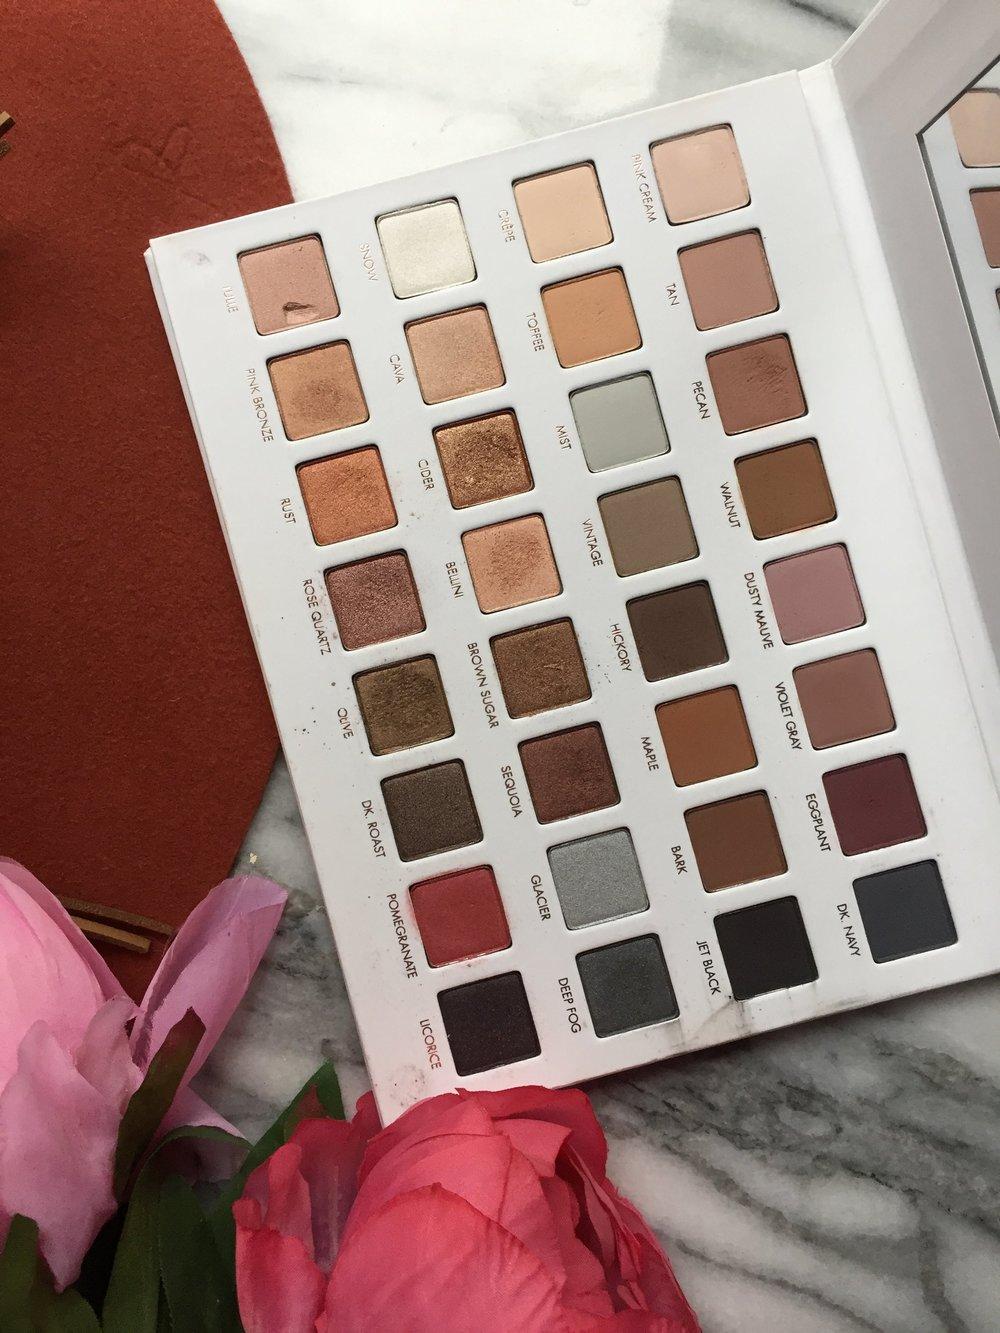 Lorac MegaPro 3 Eyeshadow Palette